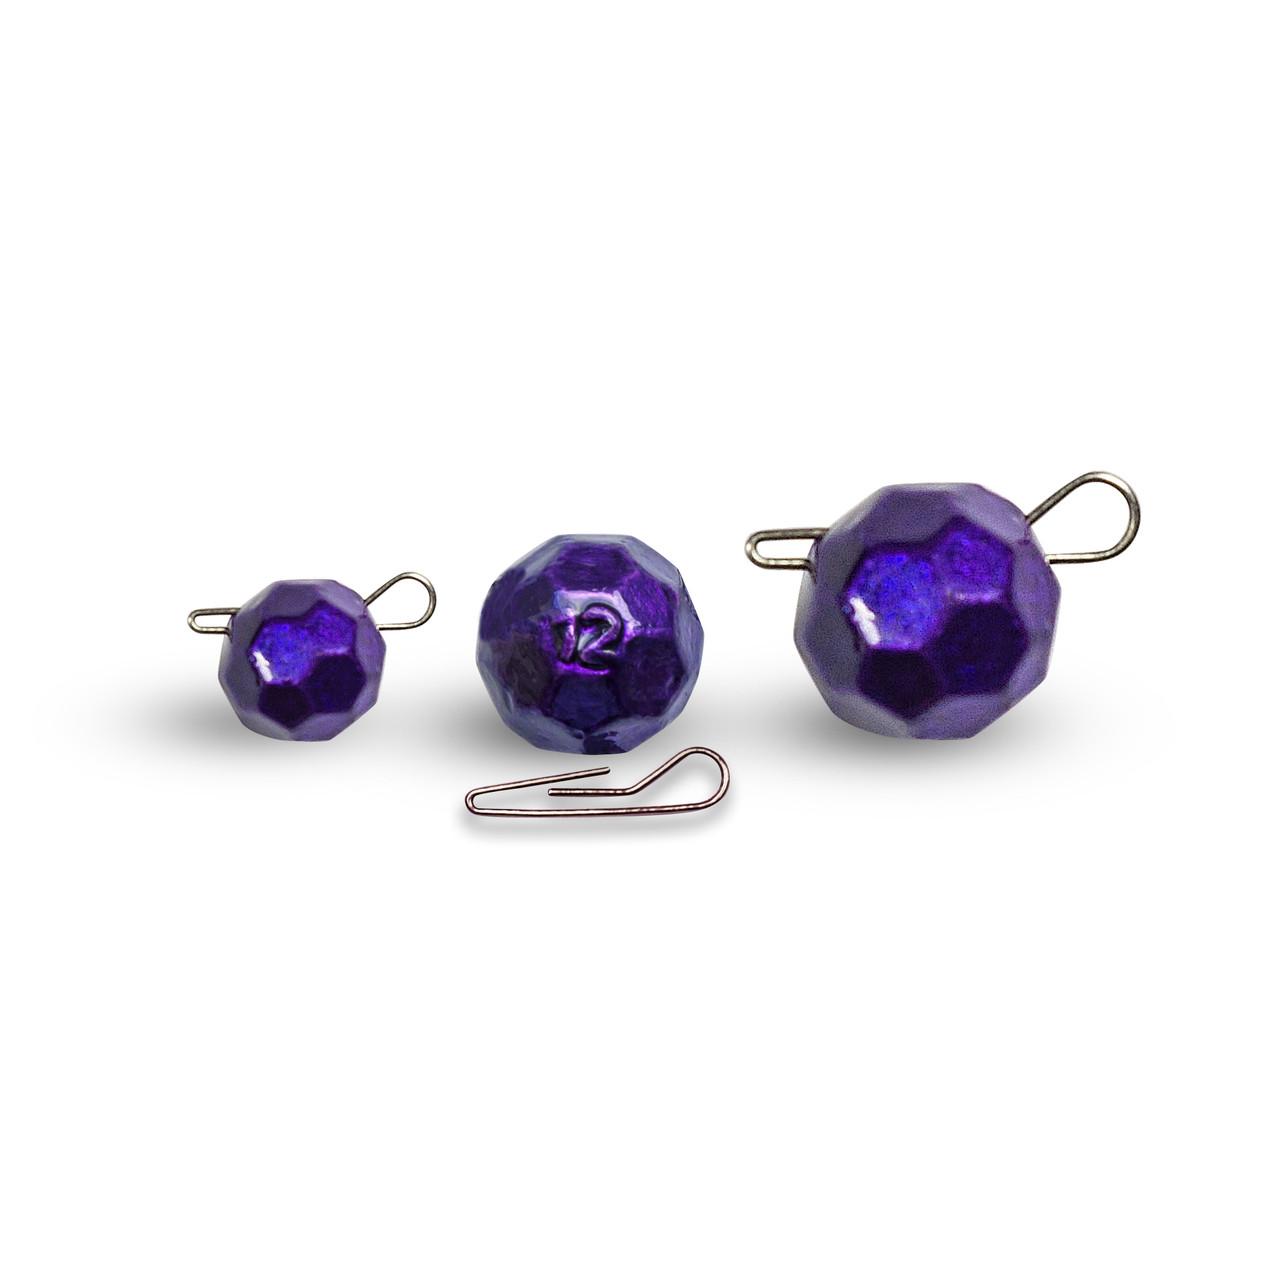 "Граненый фиолетовый груз ""Fishball"" разборный 10г (50 шт.)"